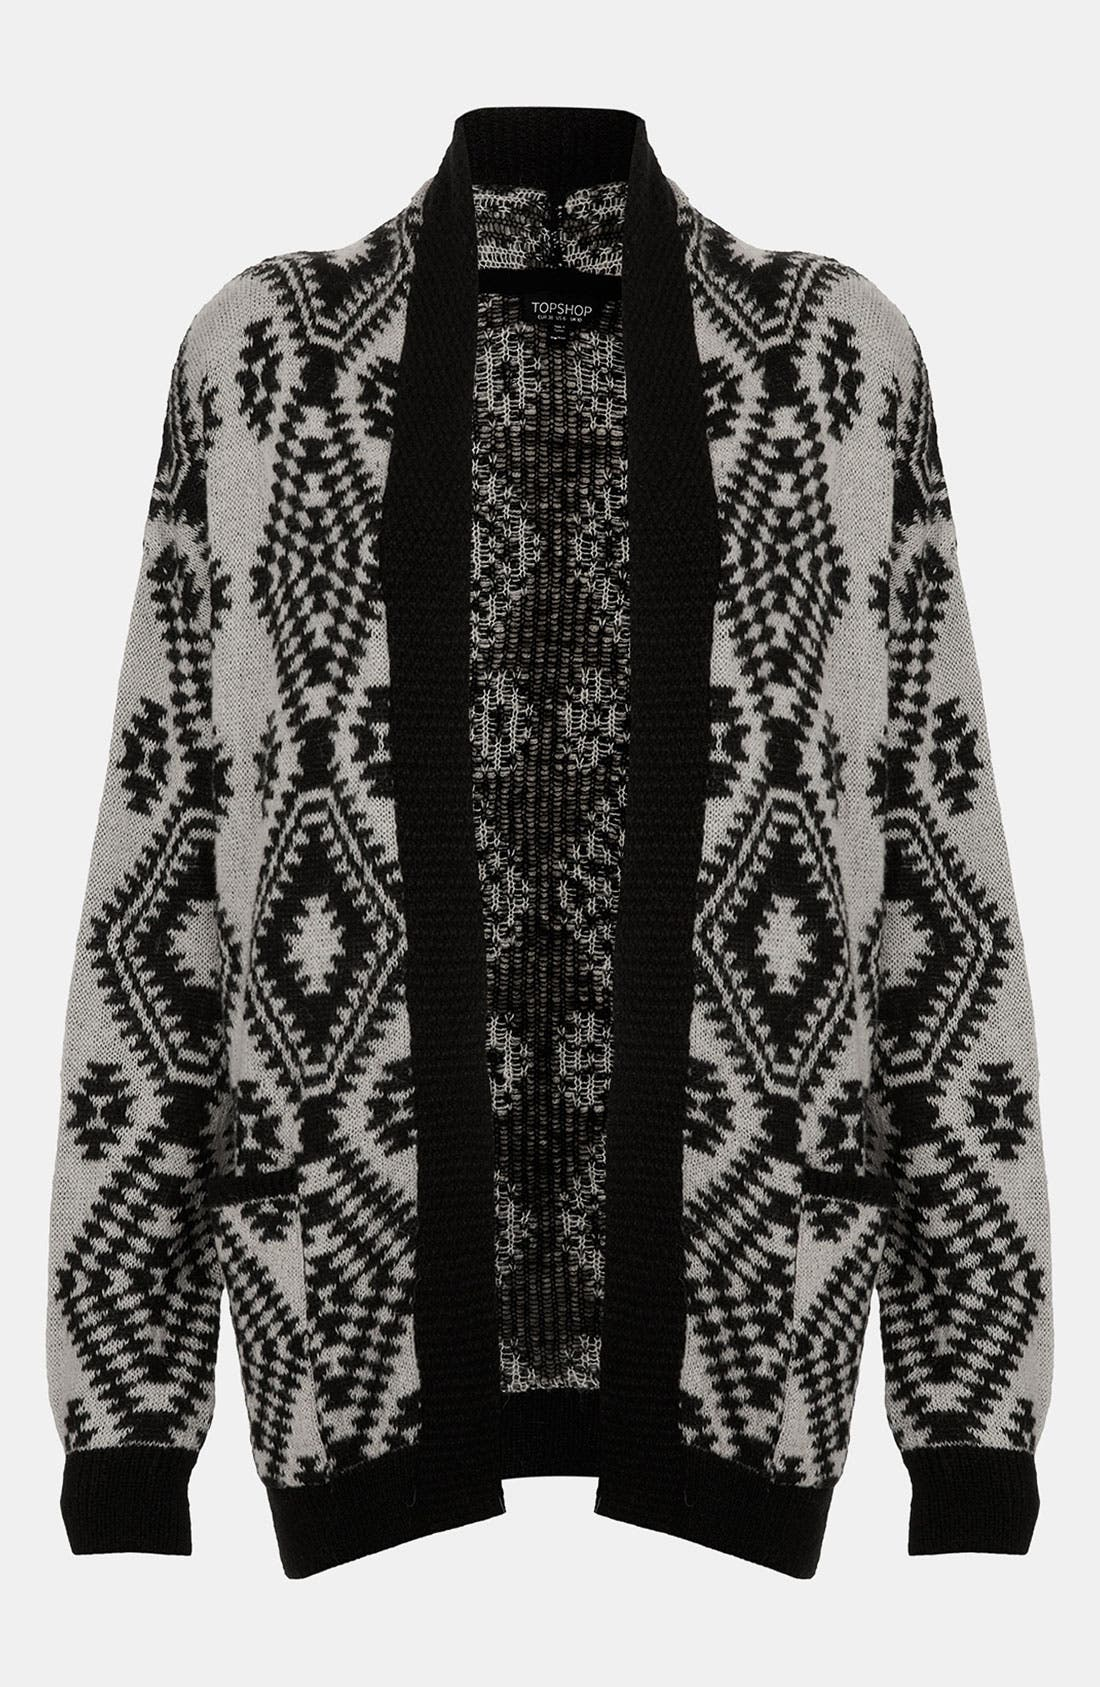 Alternate Image 1 Selected - Topshop Aztec Print Knit Cardigan